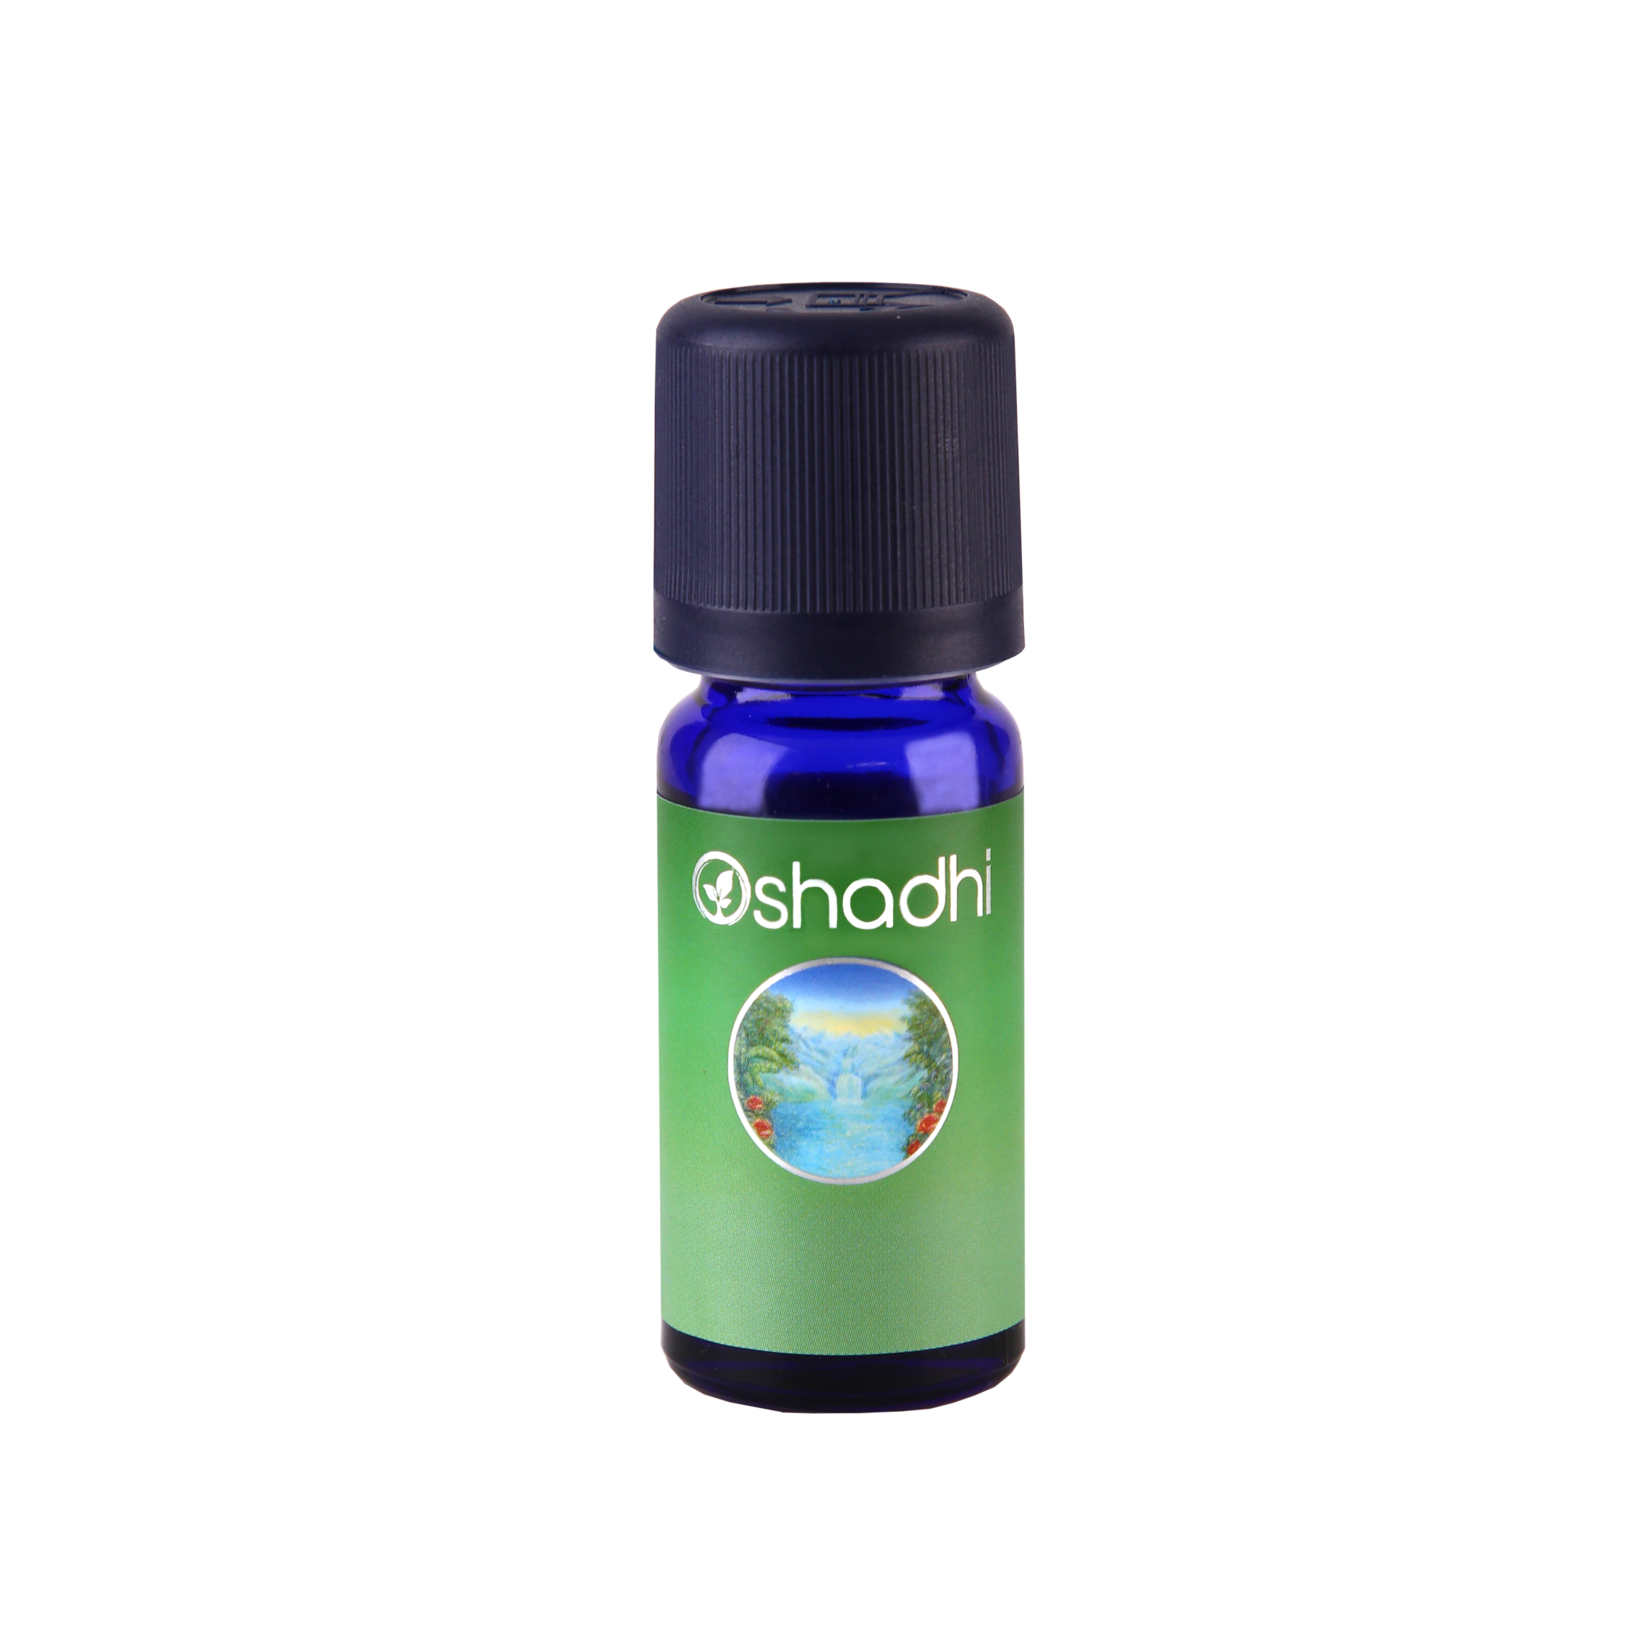 Oshadhi Synergie Relax Oshadhi - ontwinden en avondritueel - 10ml